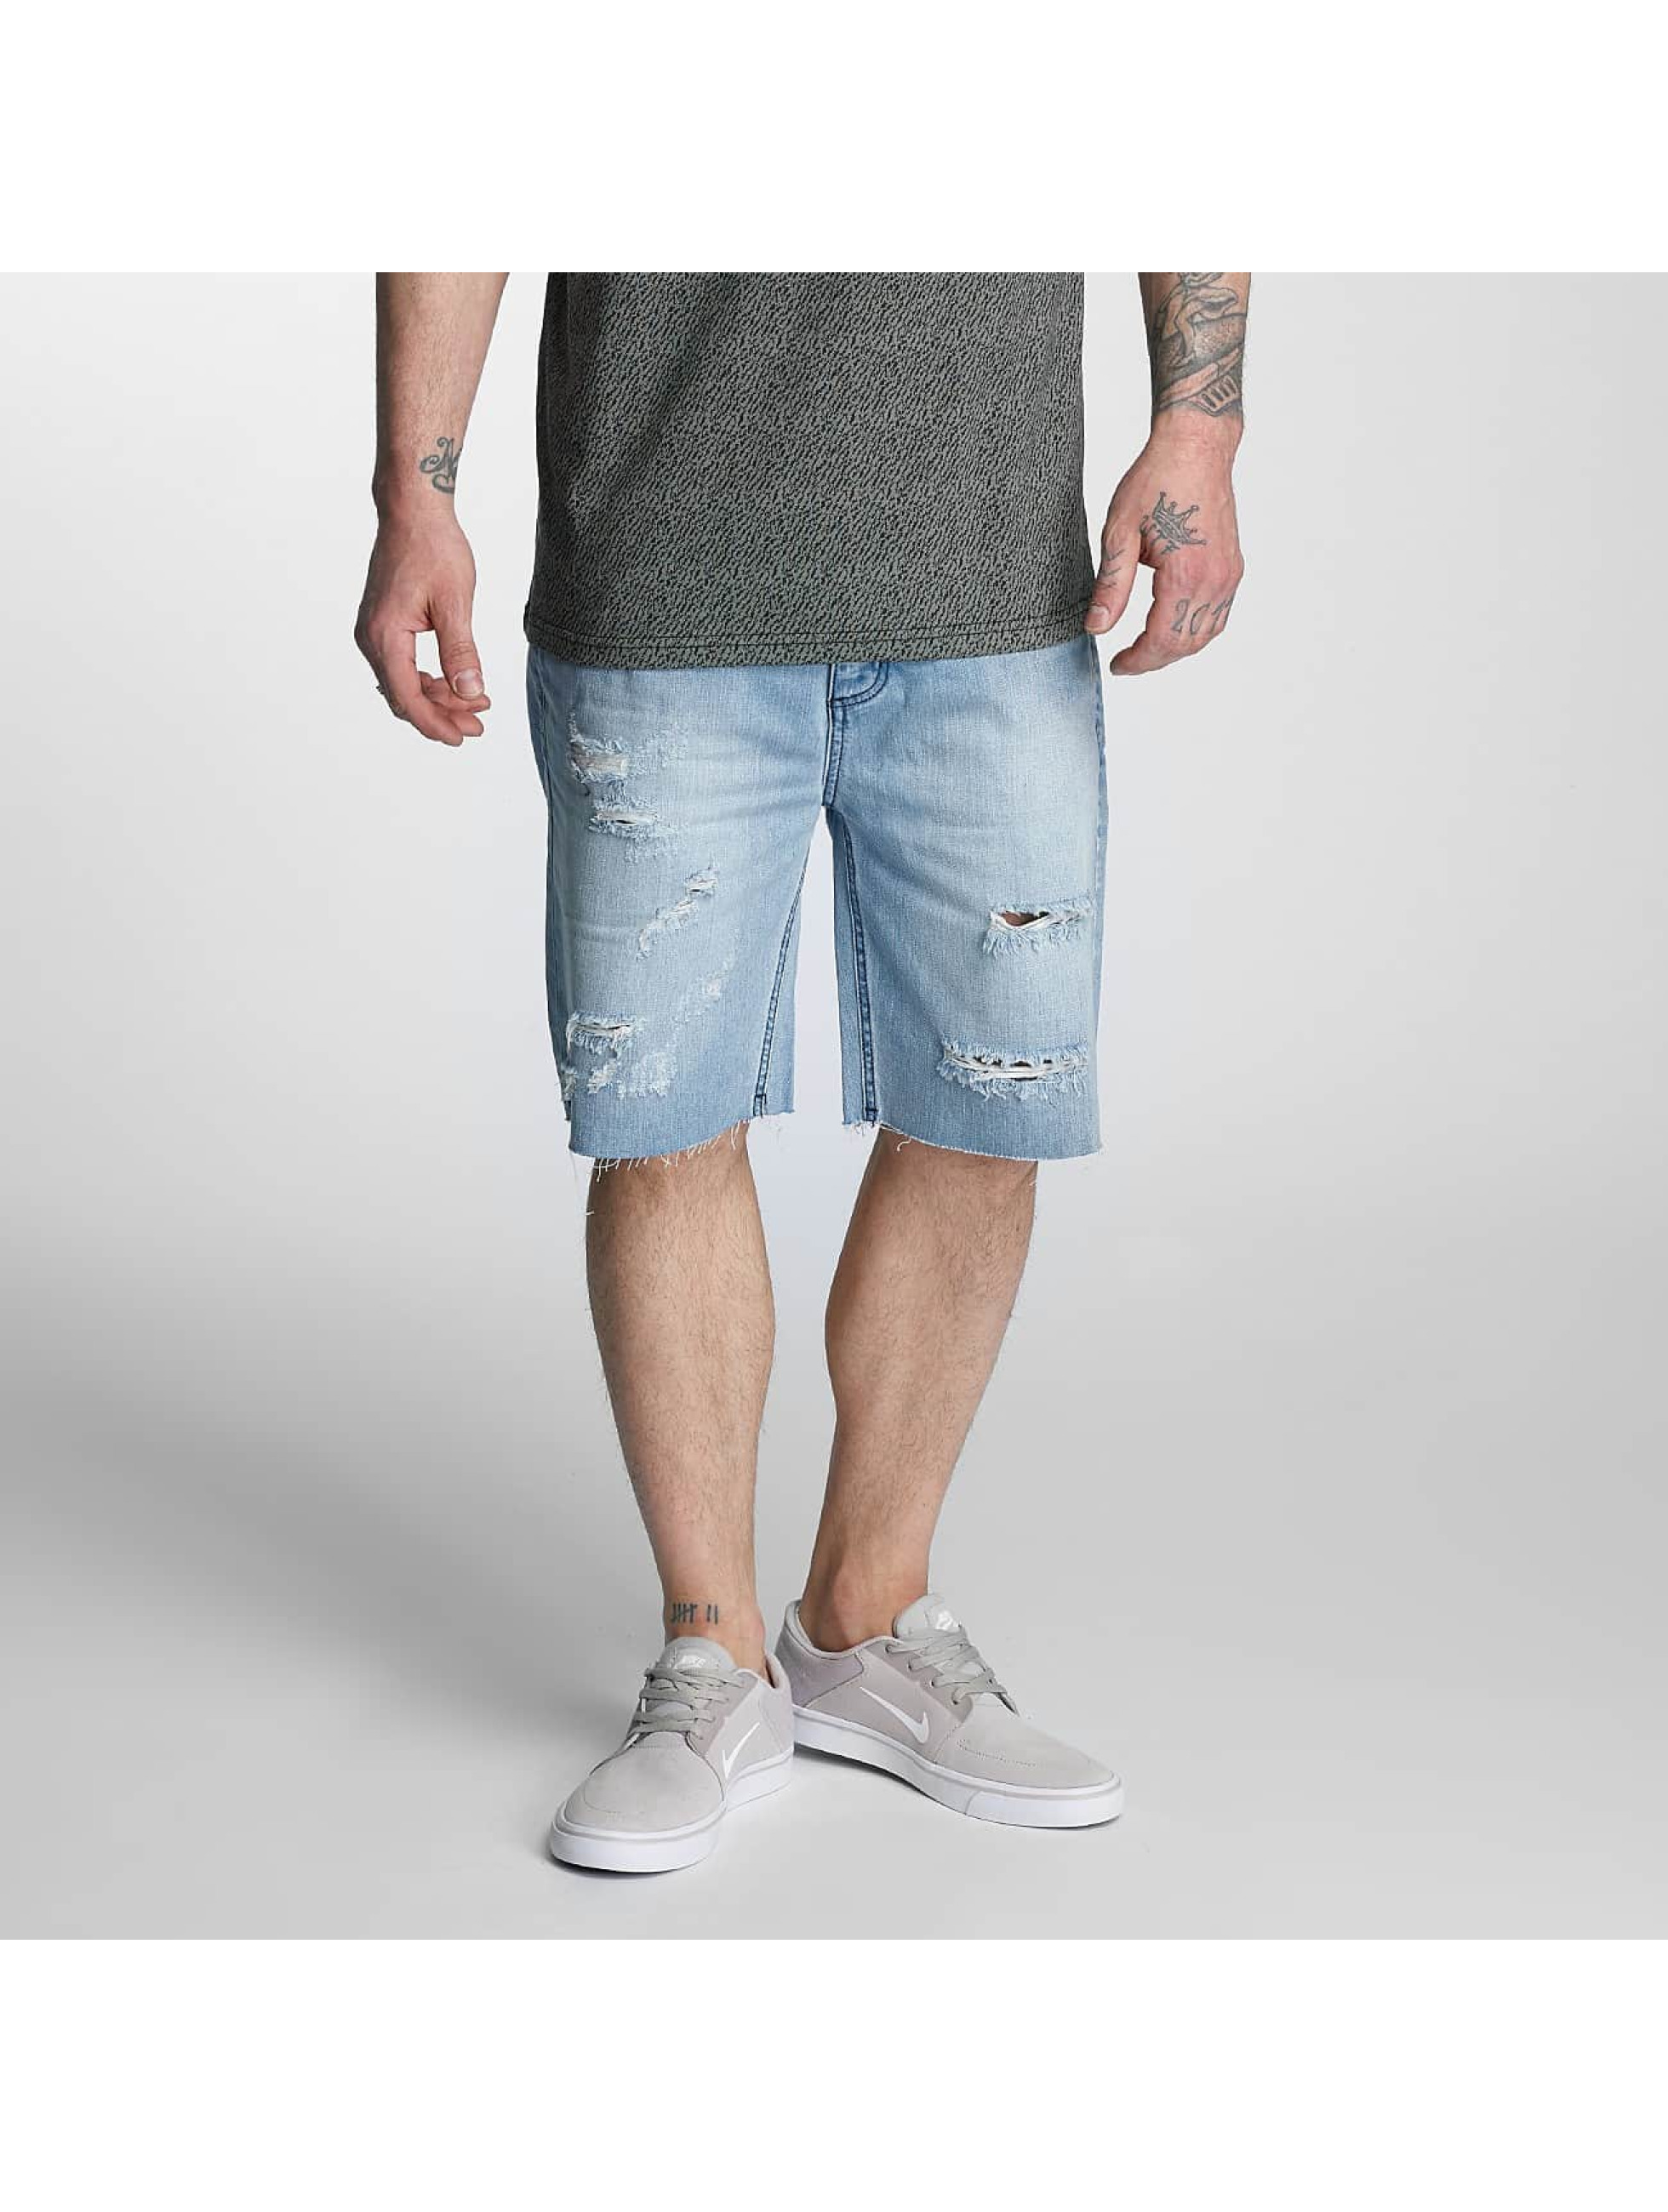 Cayler & Sons All DD Shorts Raw Edge Denim Blue Sale Angebote Döbern